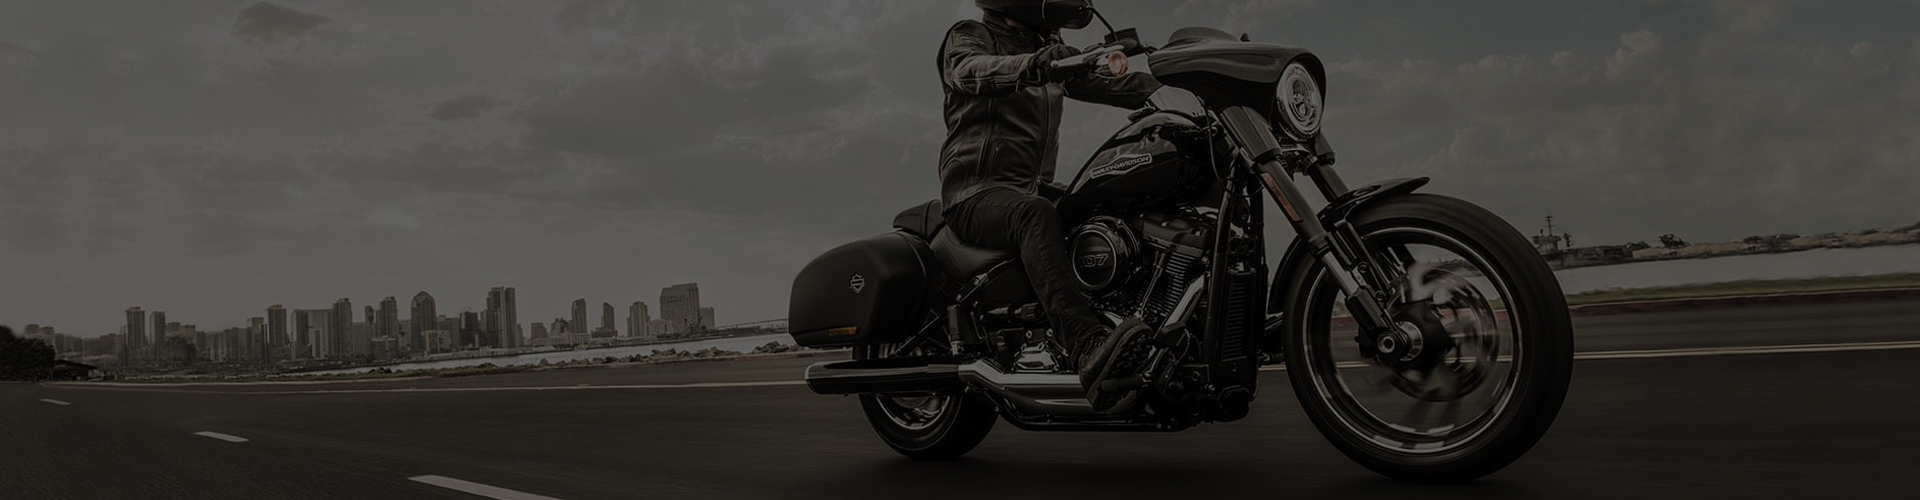 Barnaby Wilde Harley Davidson Parts | eBay Shops